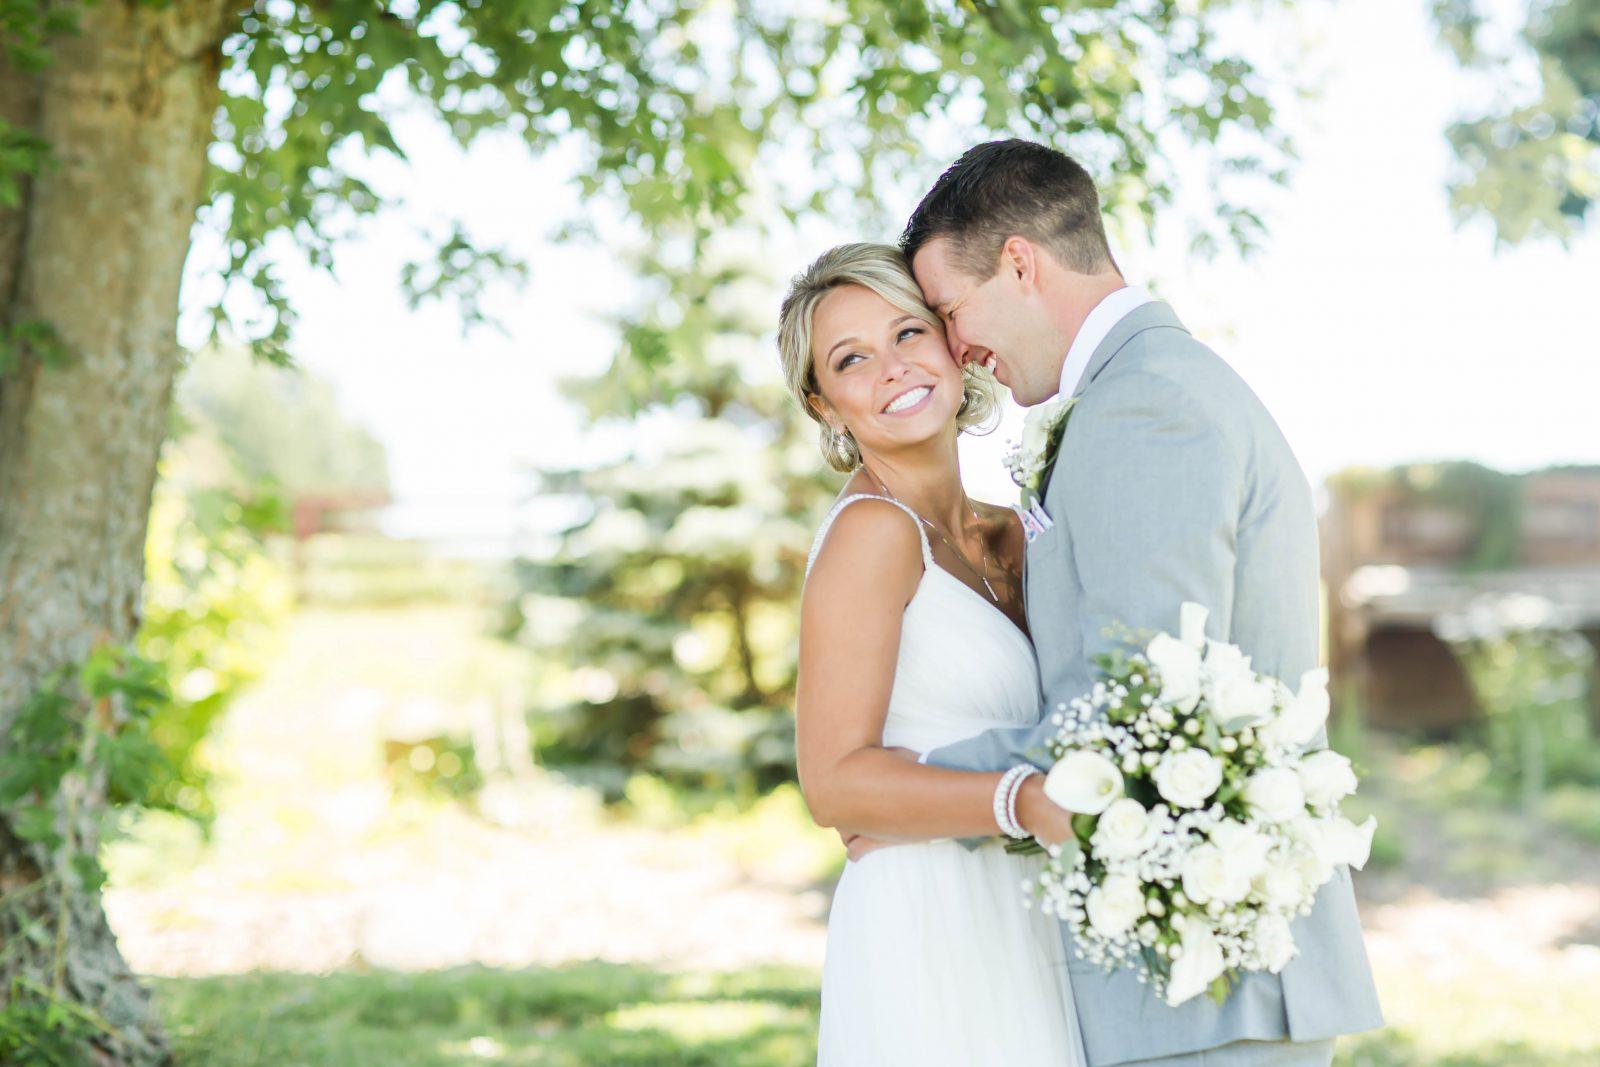 peacock-ridge-summer-wedding-photographer-akron-ohio-loren-jackson-photography-36